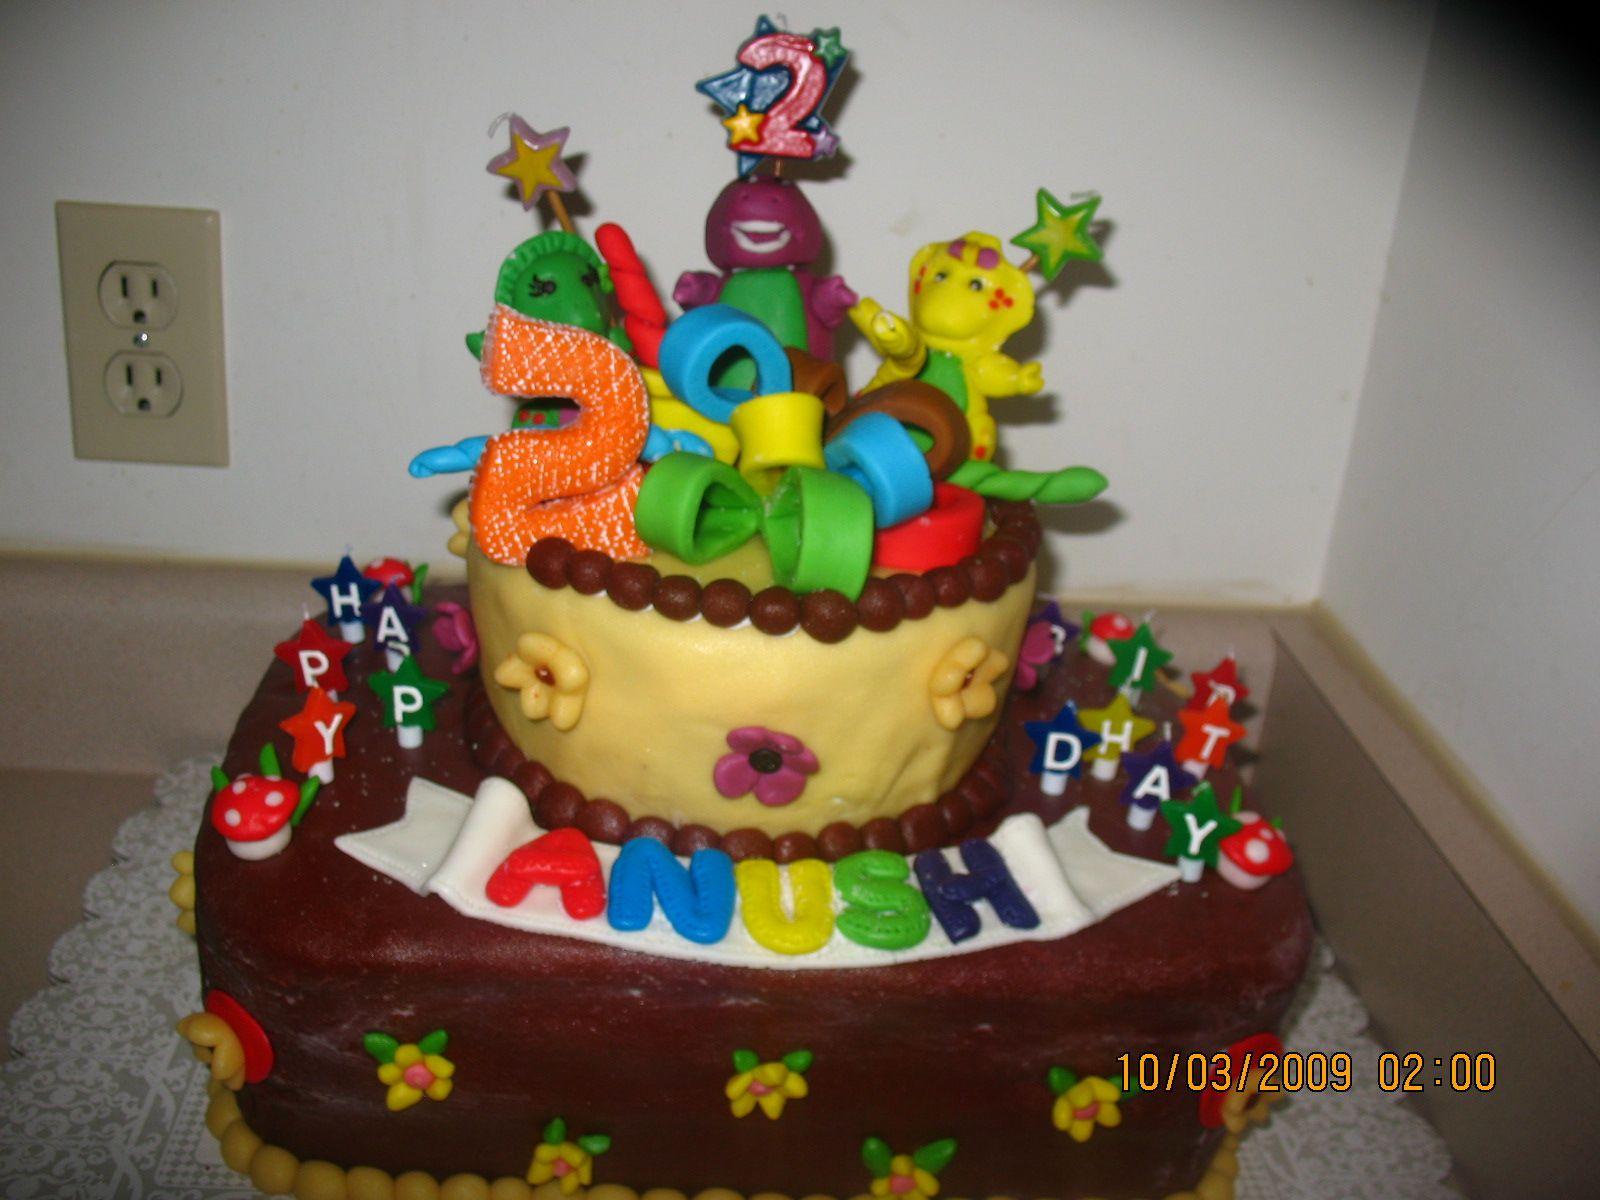 Anushs 2nd Birthday Cake Barney and Friends Fondant Cake My